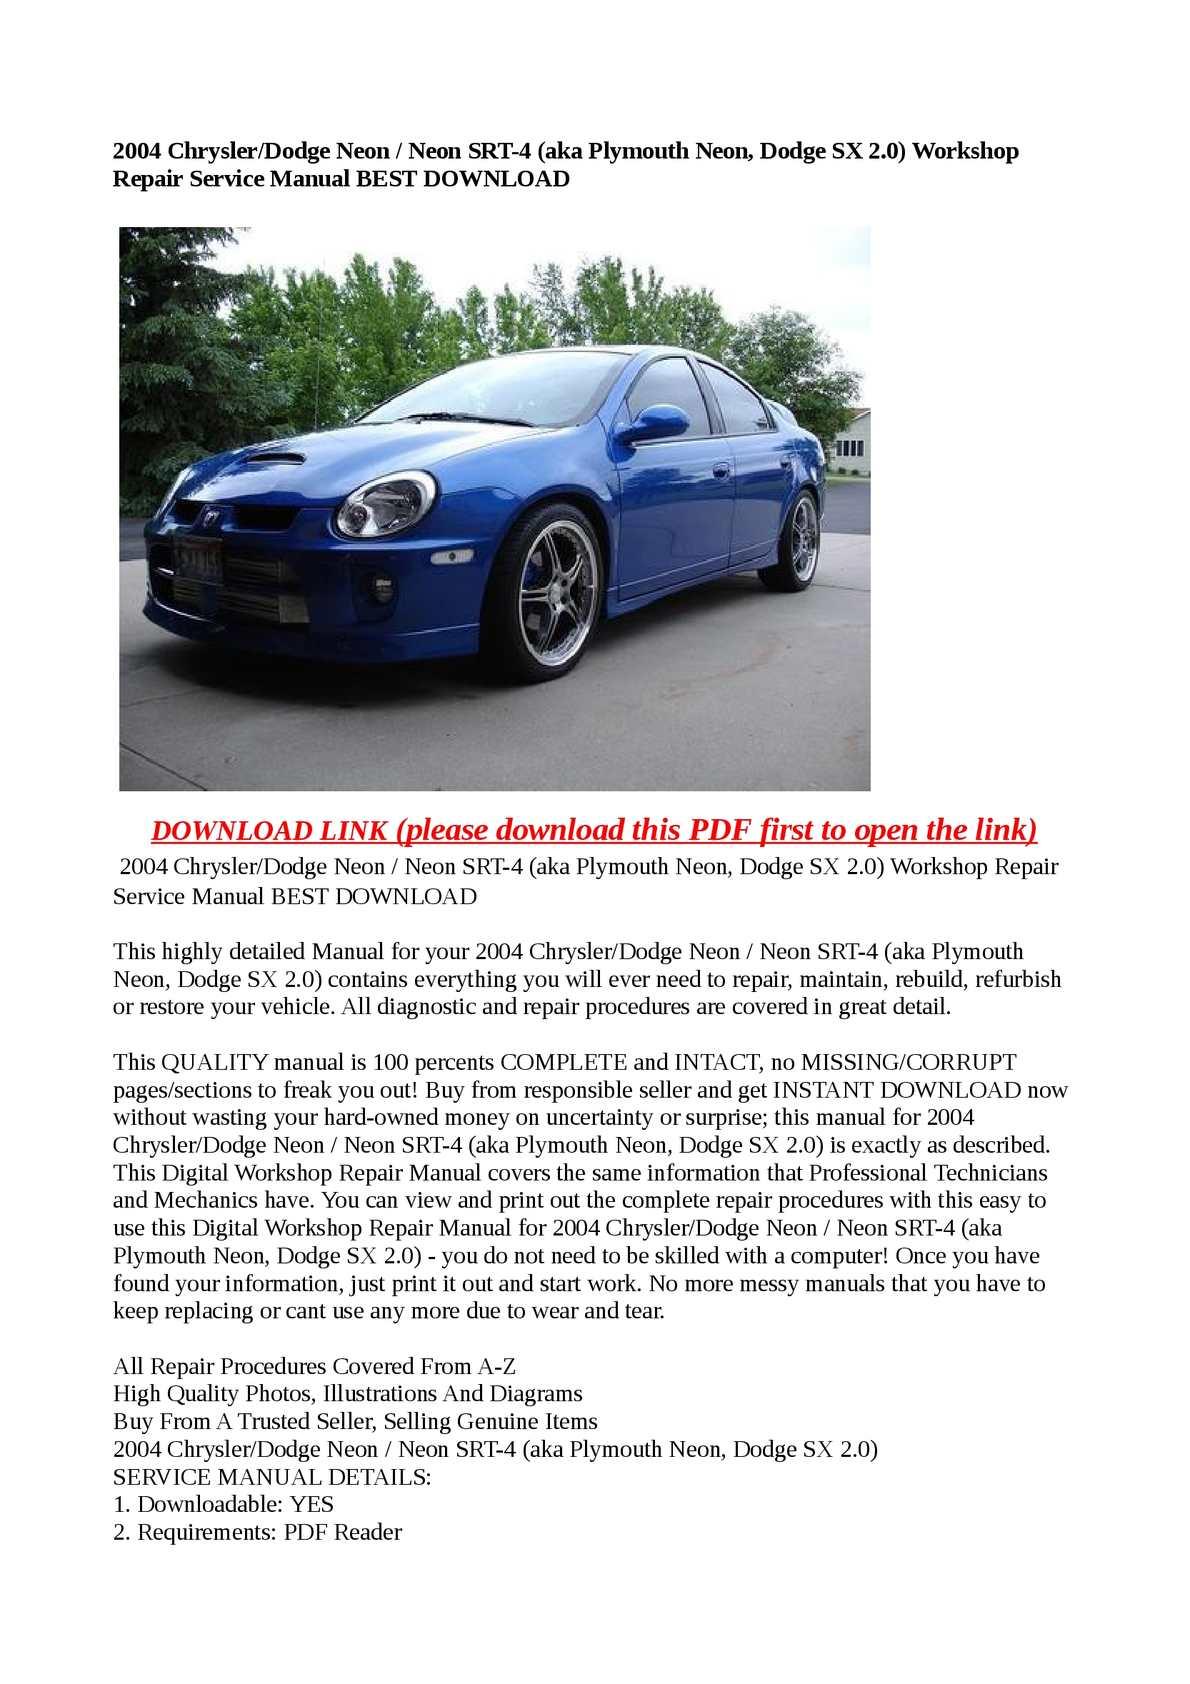 Calamo 2004 Chrysler Dodge Neon Srt 4 Aka Plymouth Repair Diagrams Sx 20 Workshop Service Manual Best Download